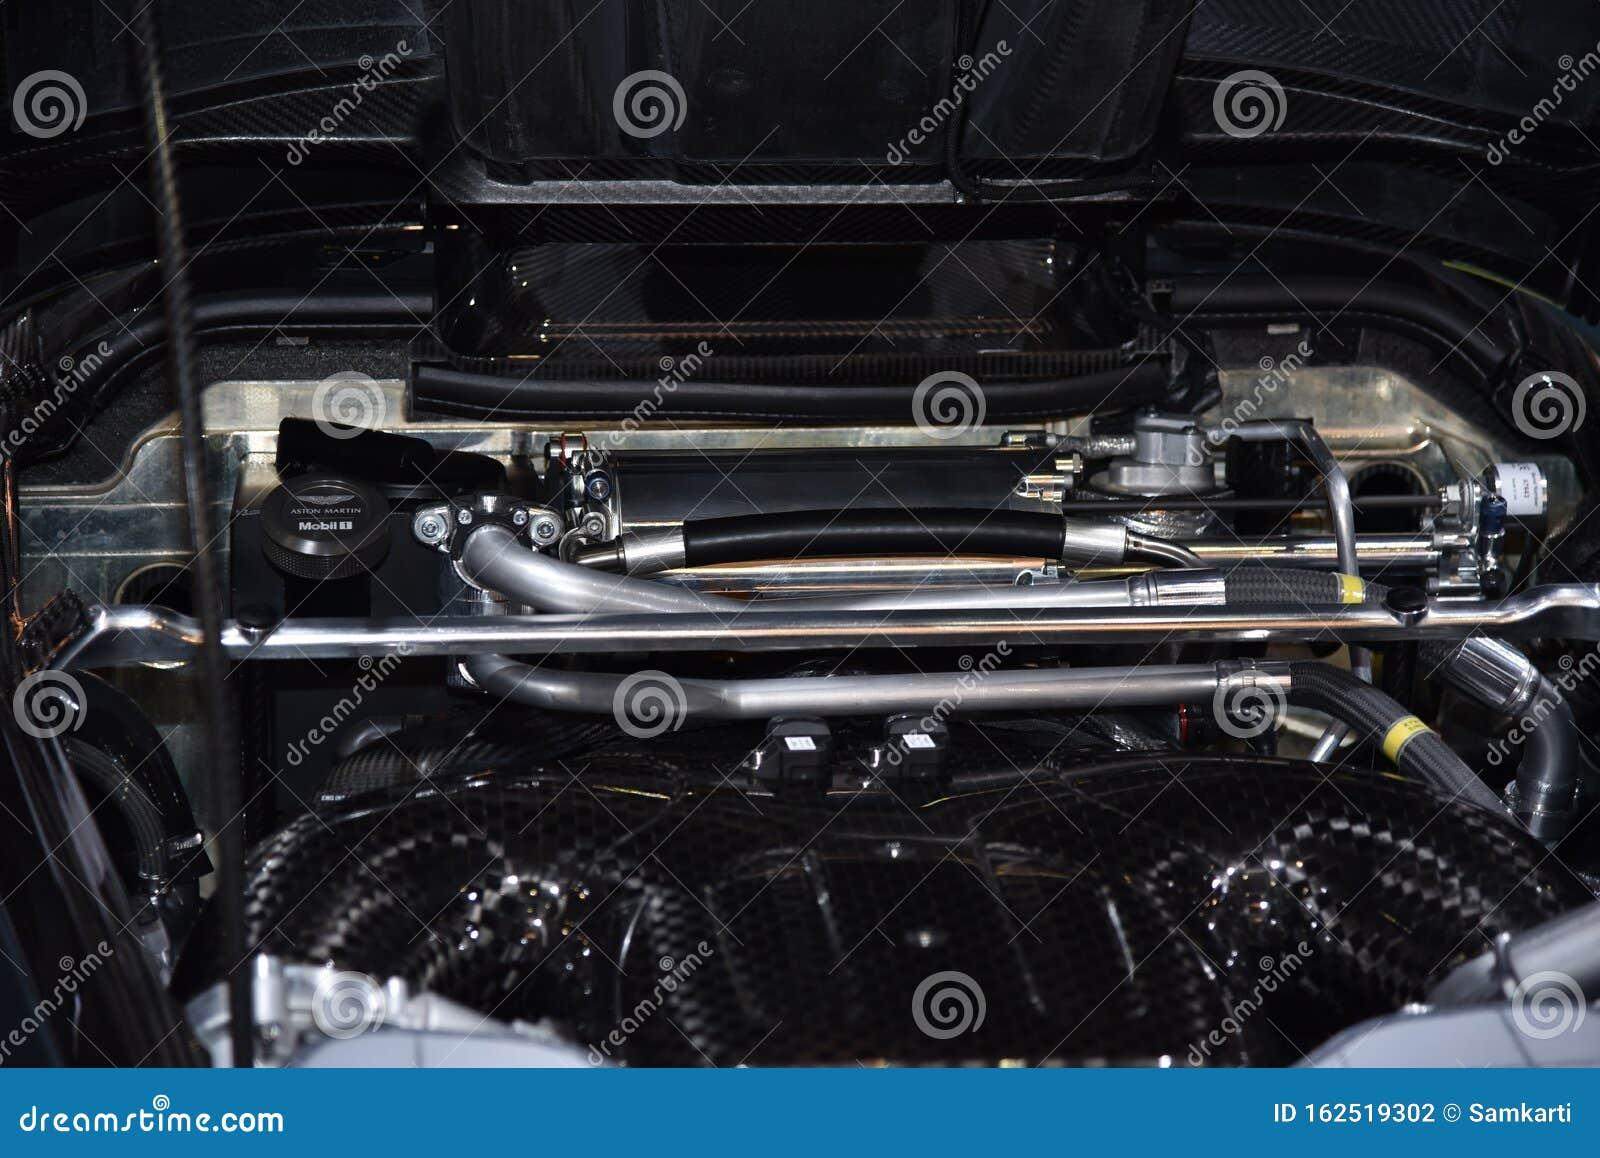 Geneva Switzerland March 06 2019 Aston Martin Valkyrie Geneva International Motor Show 2019 Editorial Photography Image Of Auto Sport 162519302